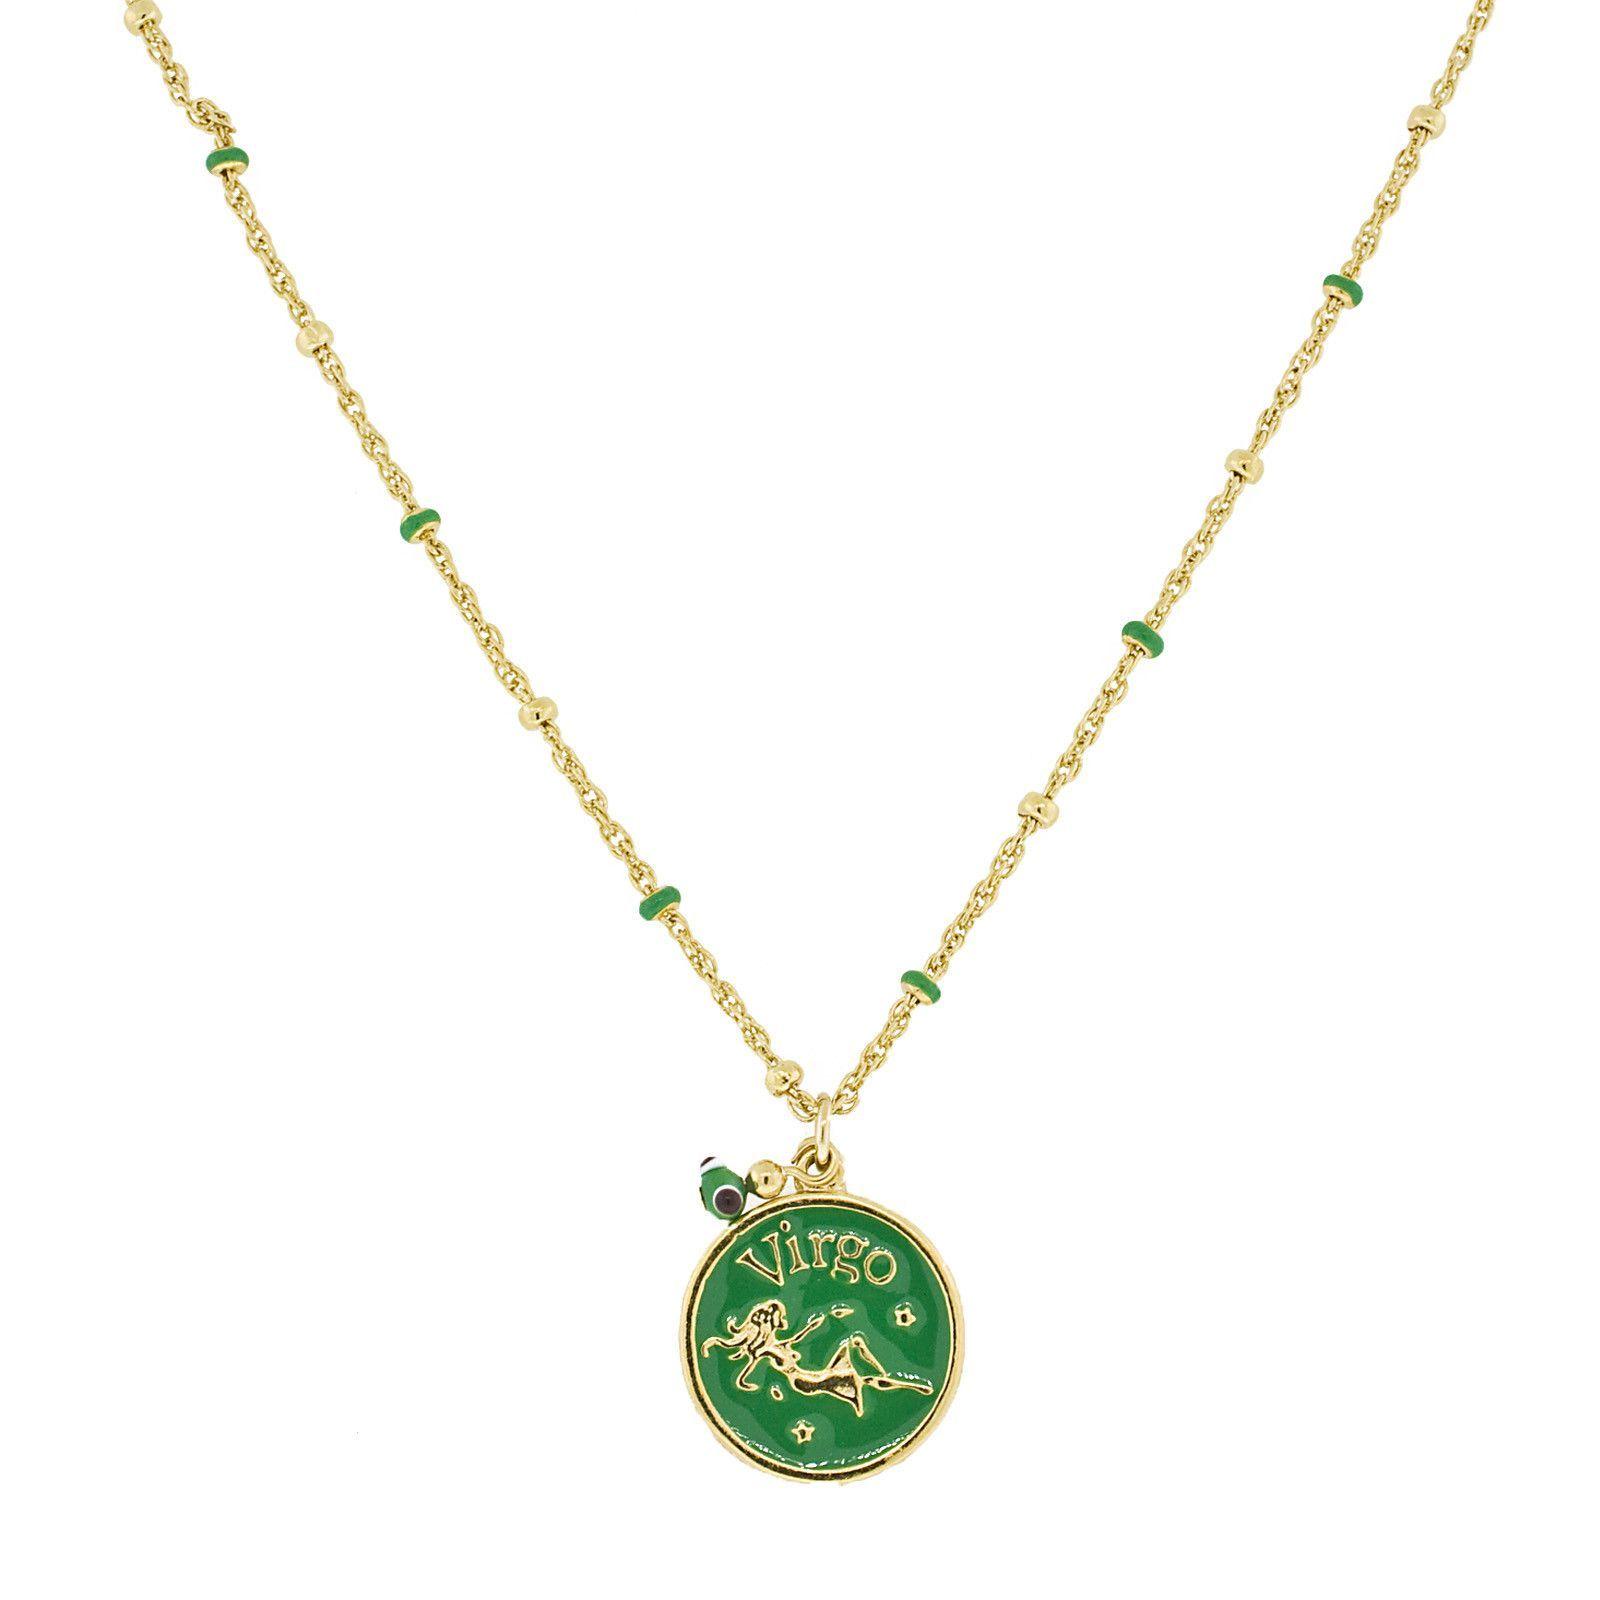 Blee Inara Enamel Horoscope Necklace - Virgo